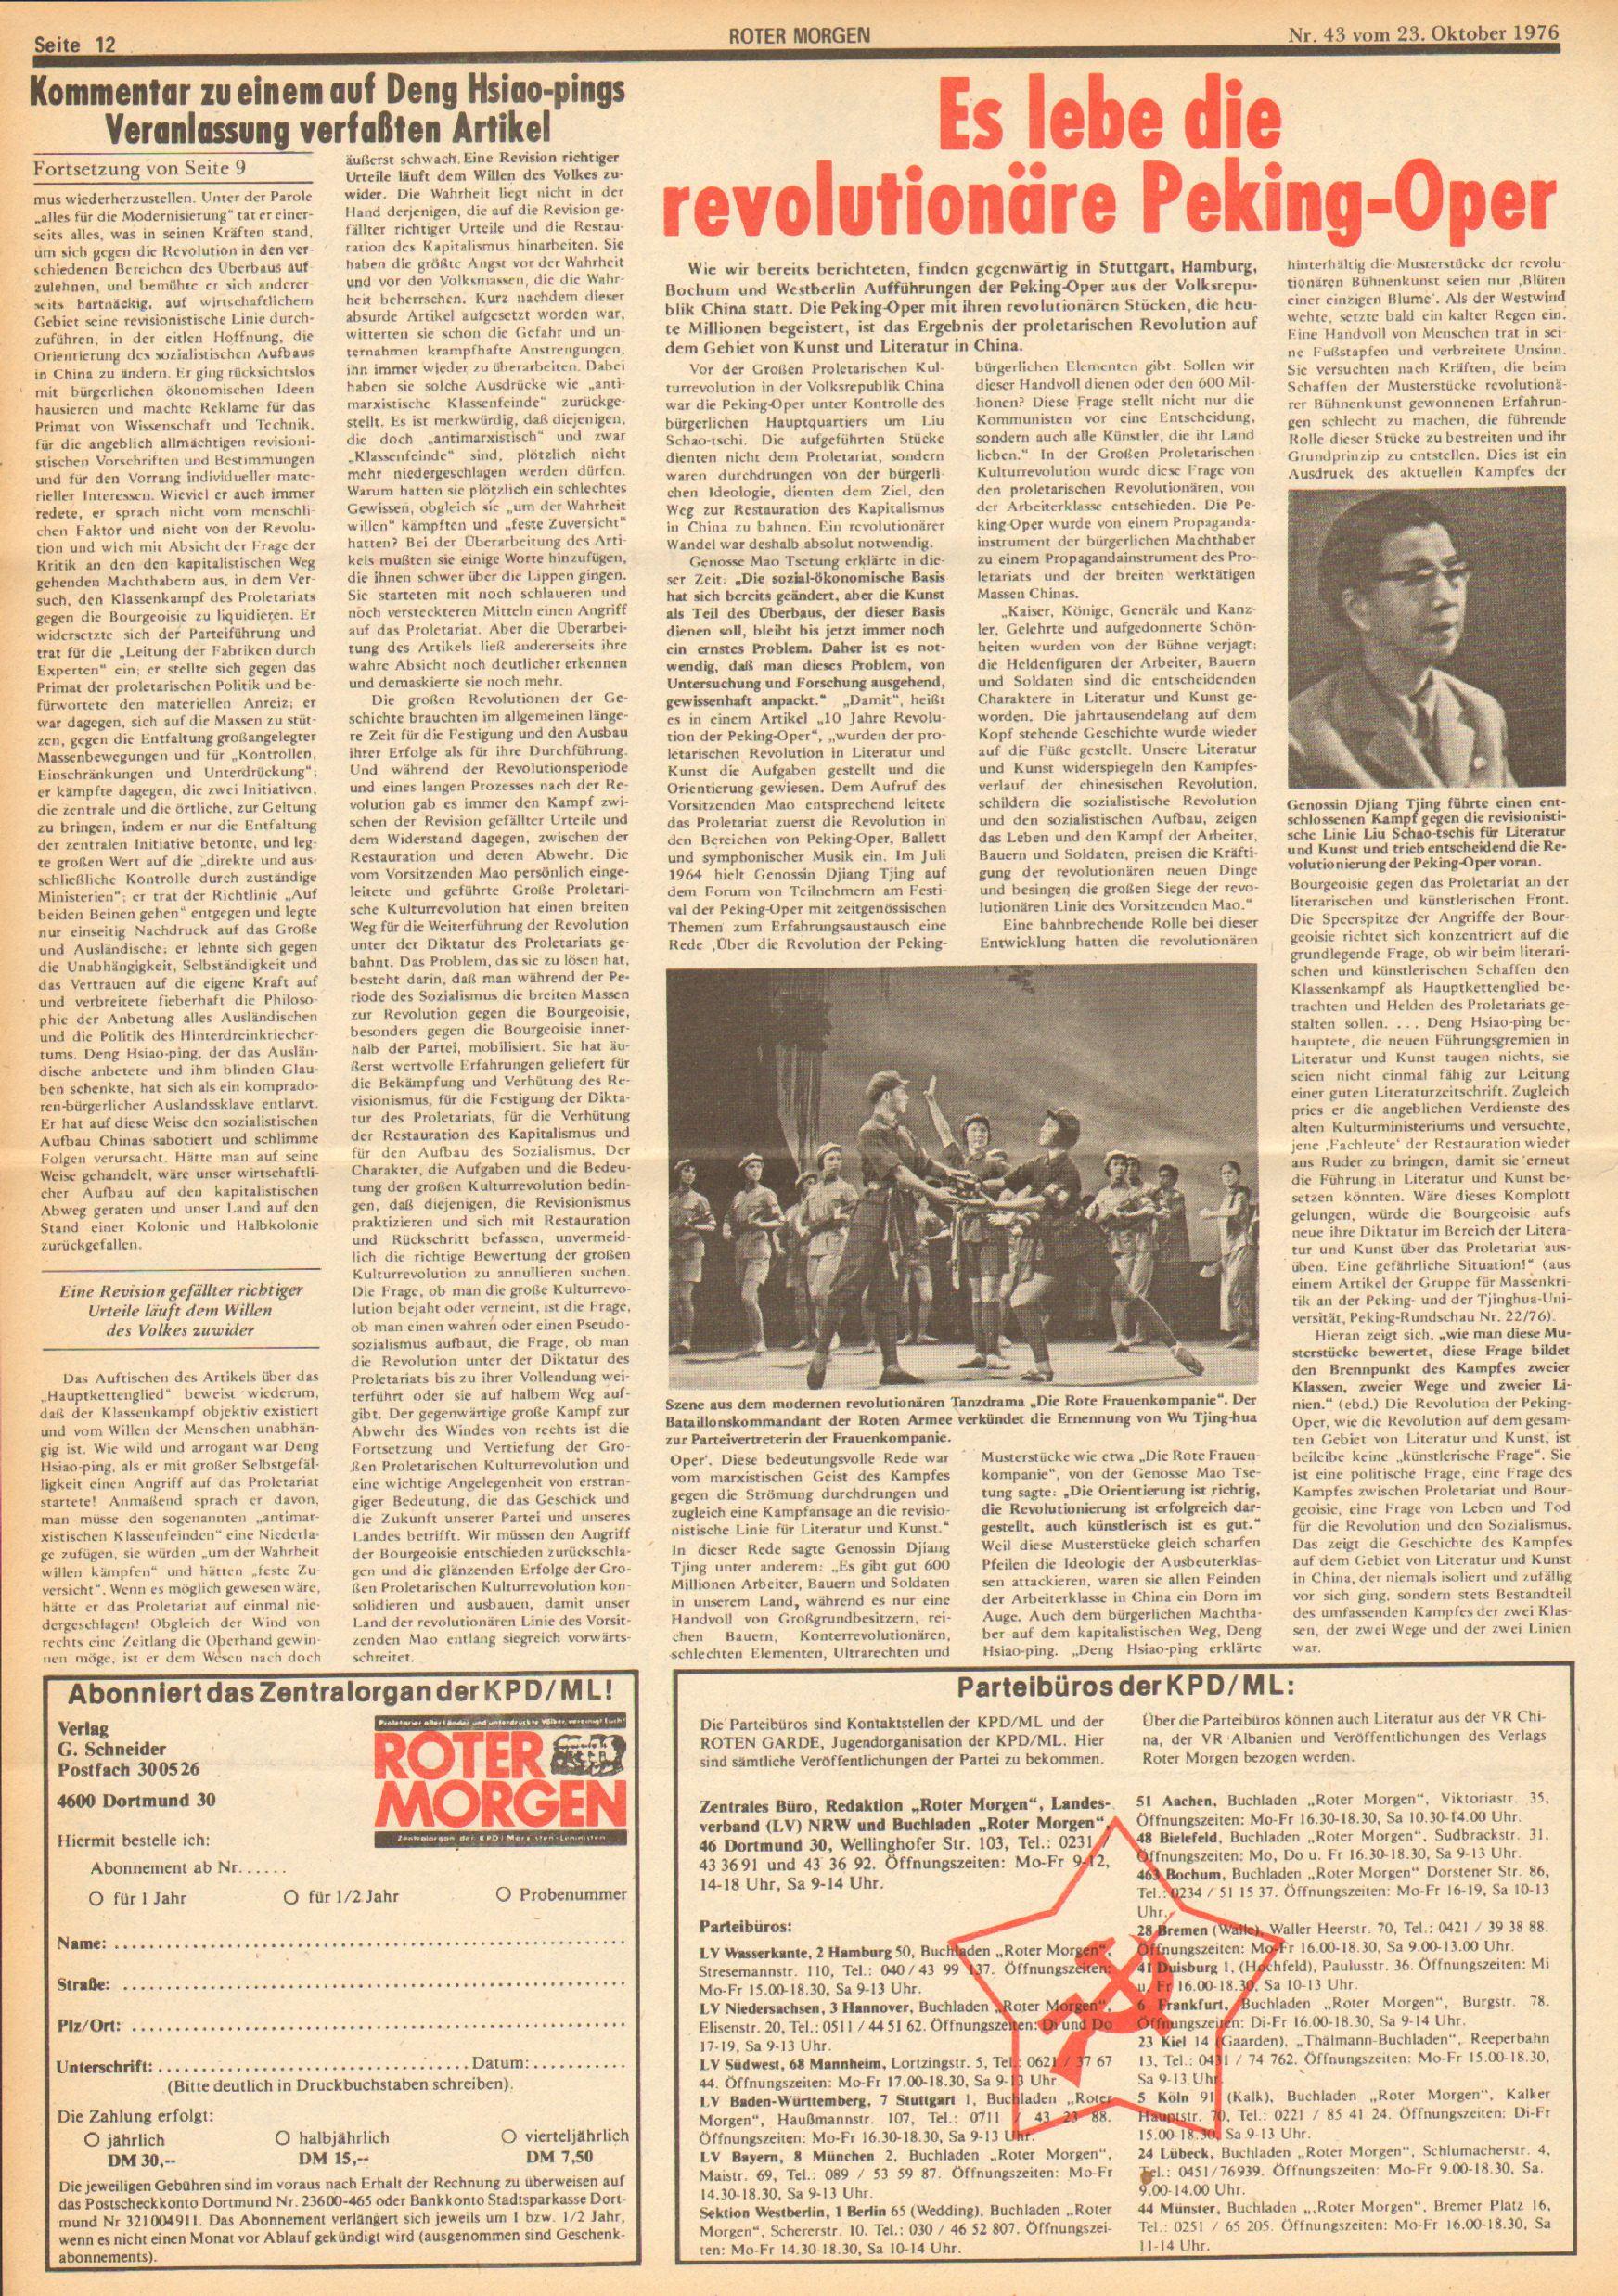 Roter Morgen, 10. Jg., 23. Oktober 1976, Nr. 43, Seite 12